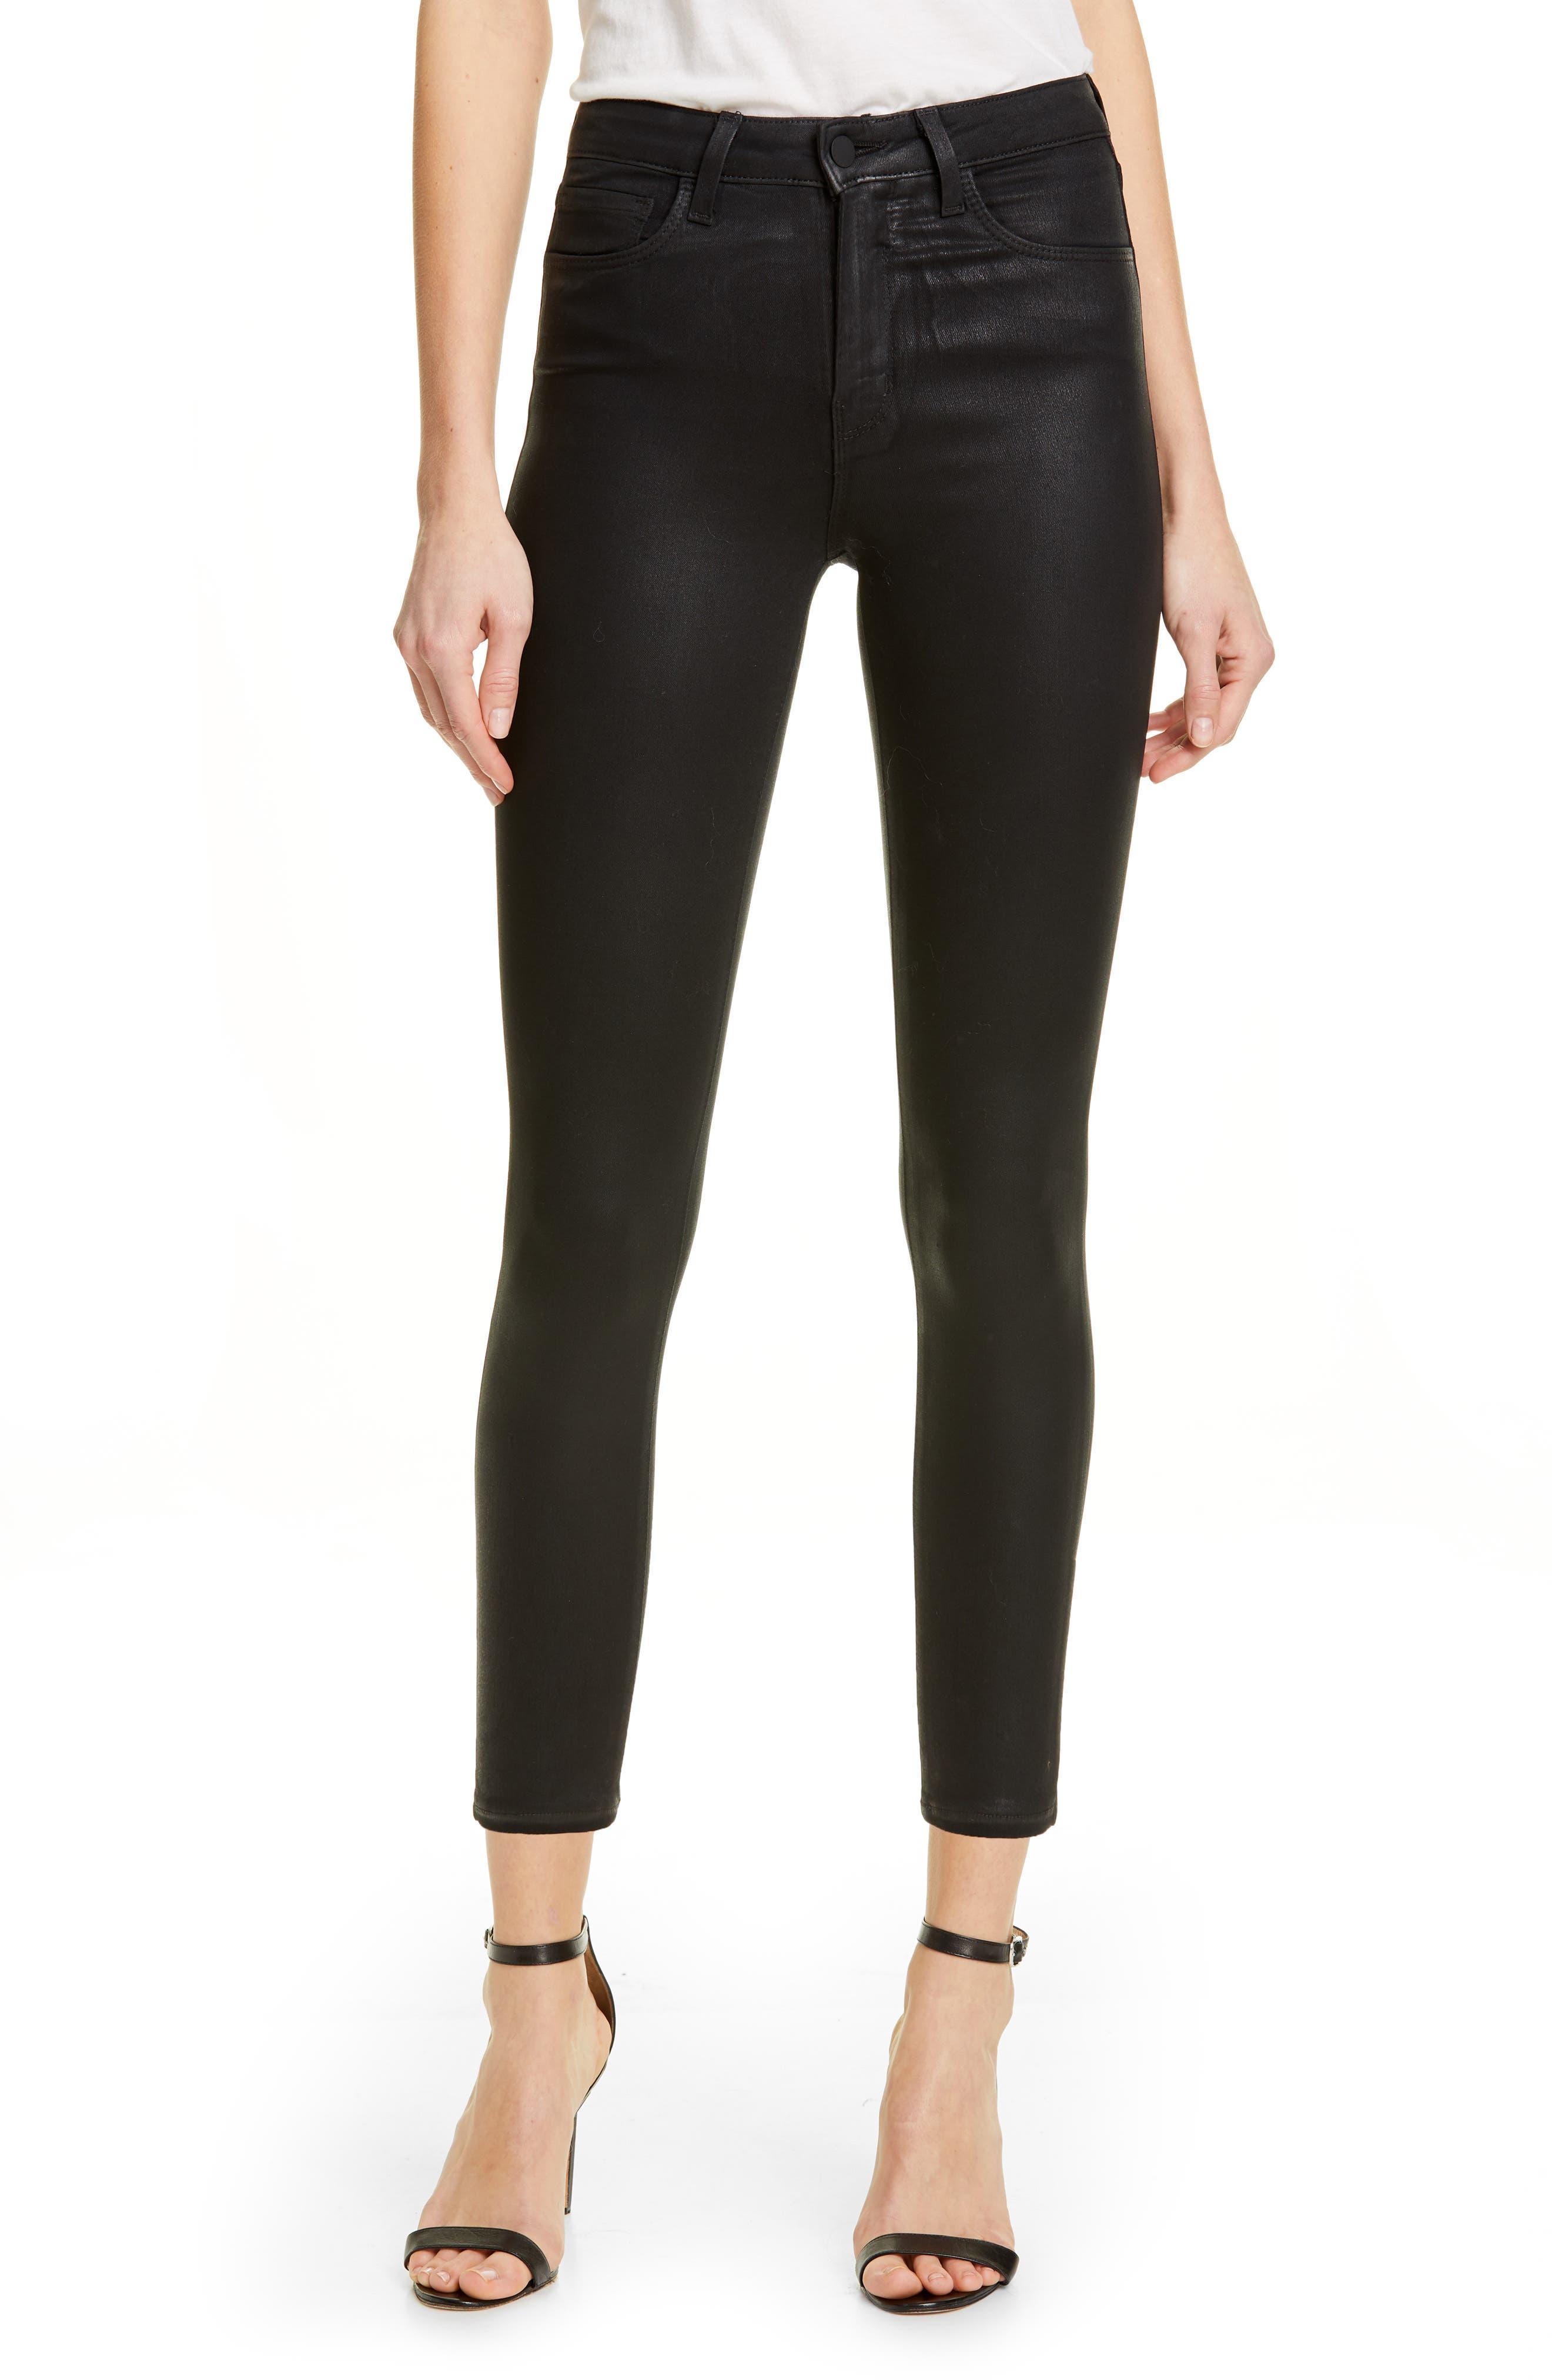 L'AGENCE Coated High Waist Skinny Jeans, Main, color, BLACK COATED